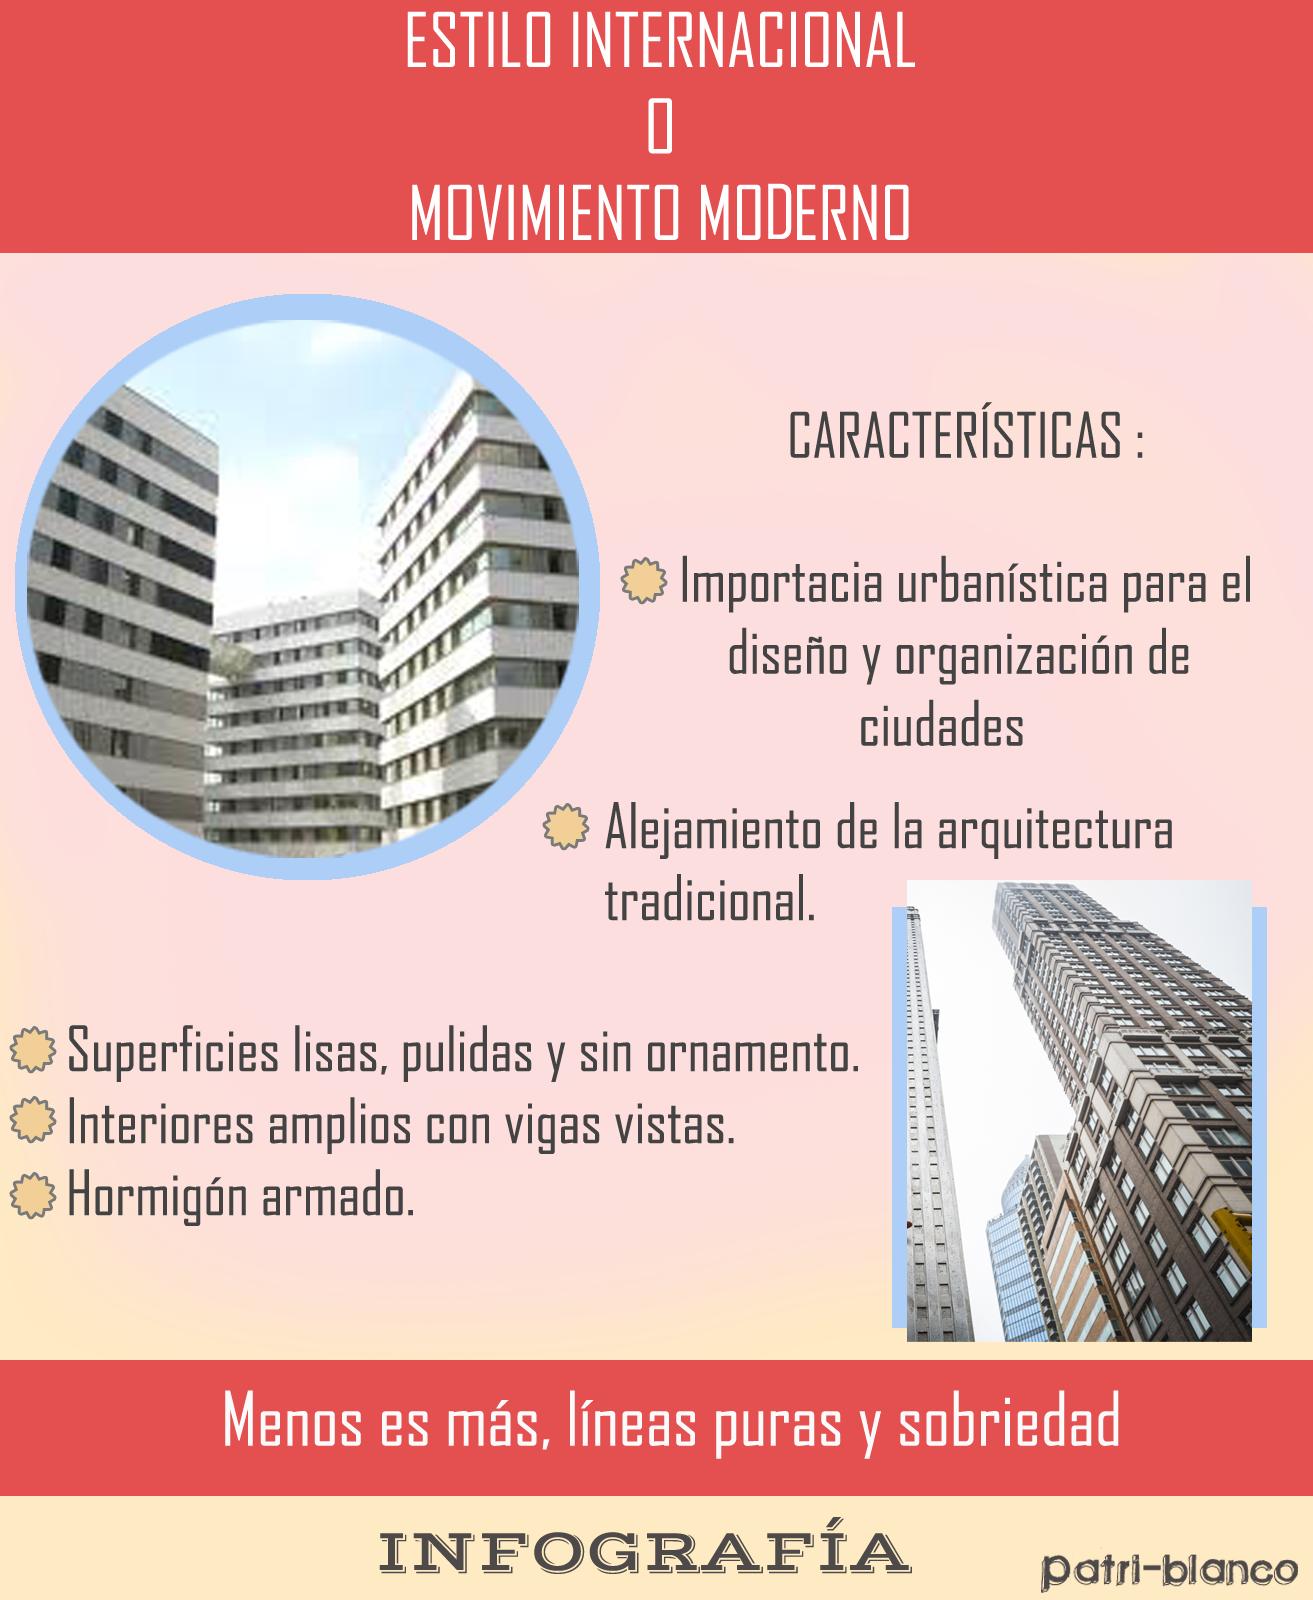 Estilo (XXV) internacional o movimiento moderno